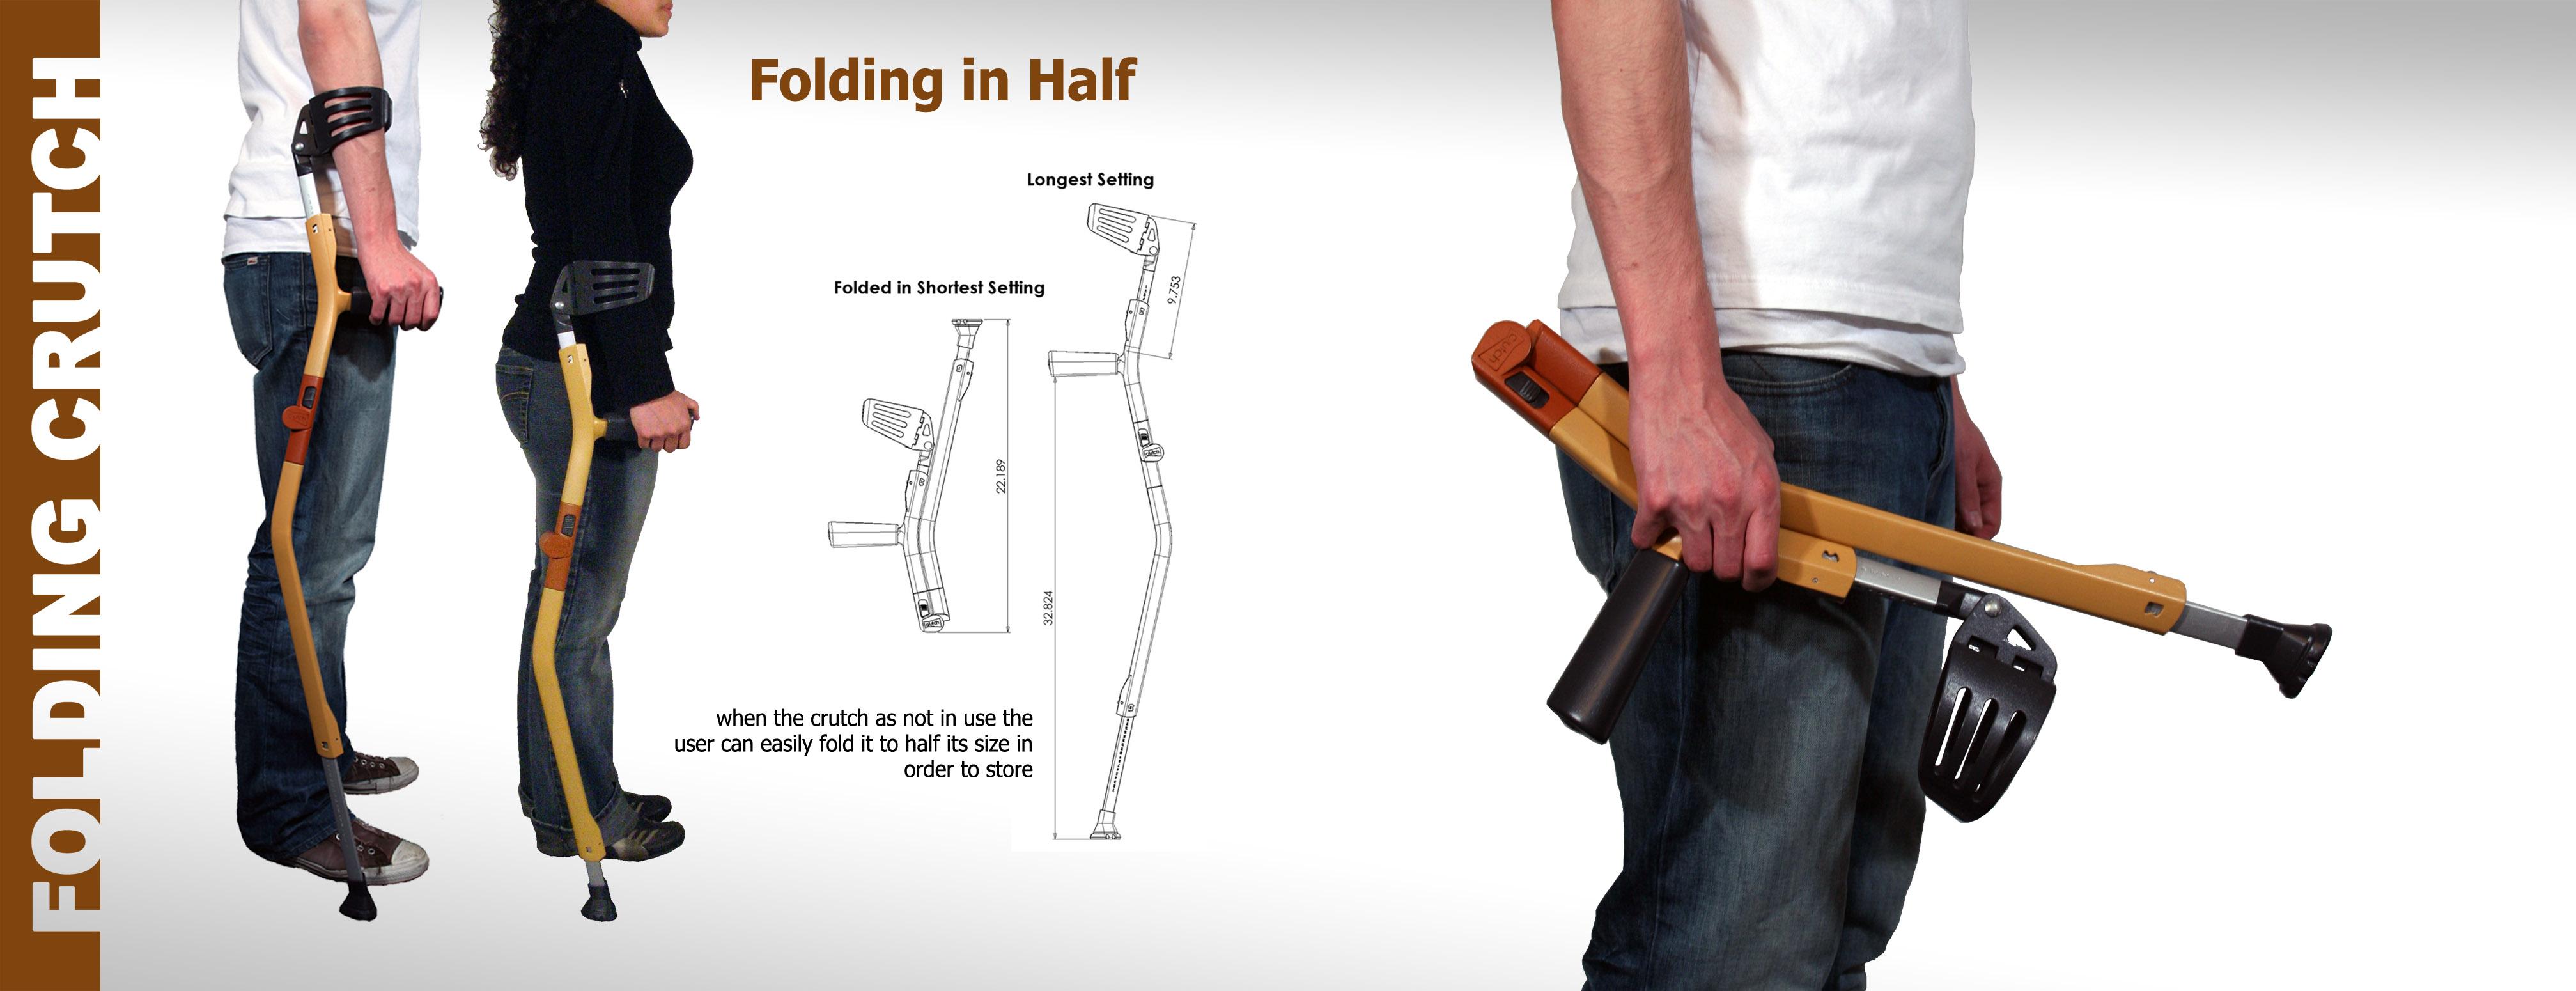 forearm crutch design by mark menendez at coroflot